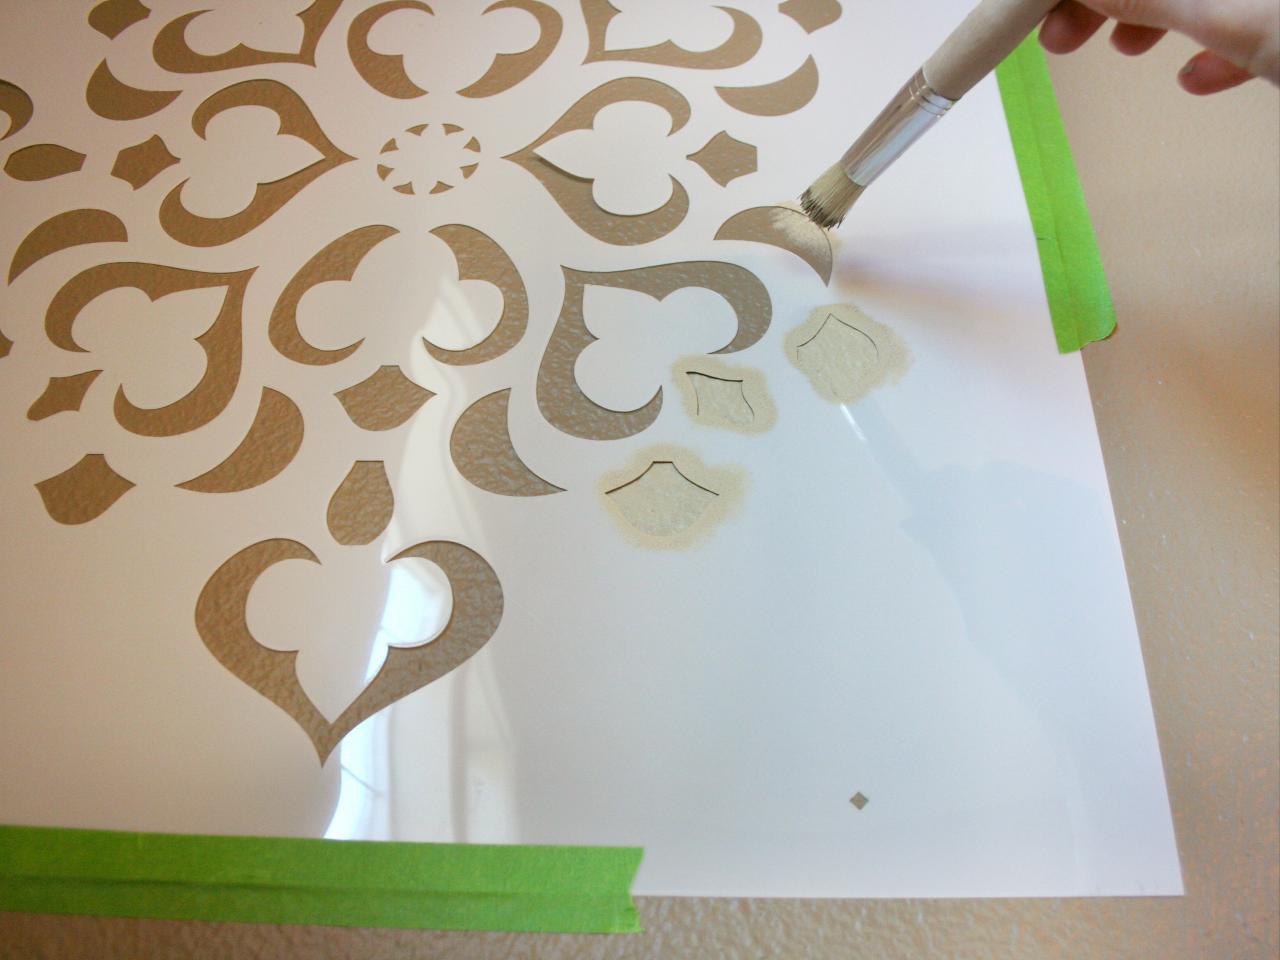 Design Stencils For Walls design studios large ribbon damask wall stencil Paint Using Stippling Method